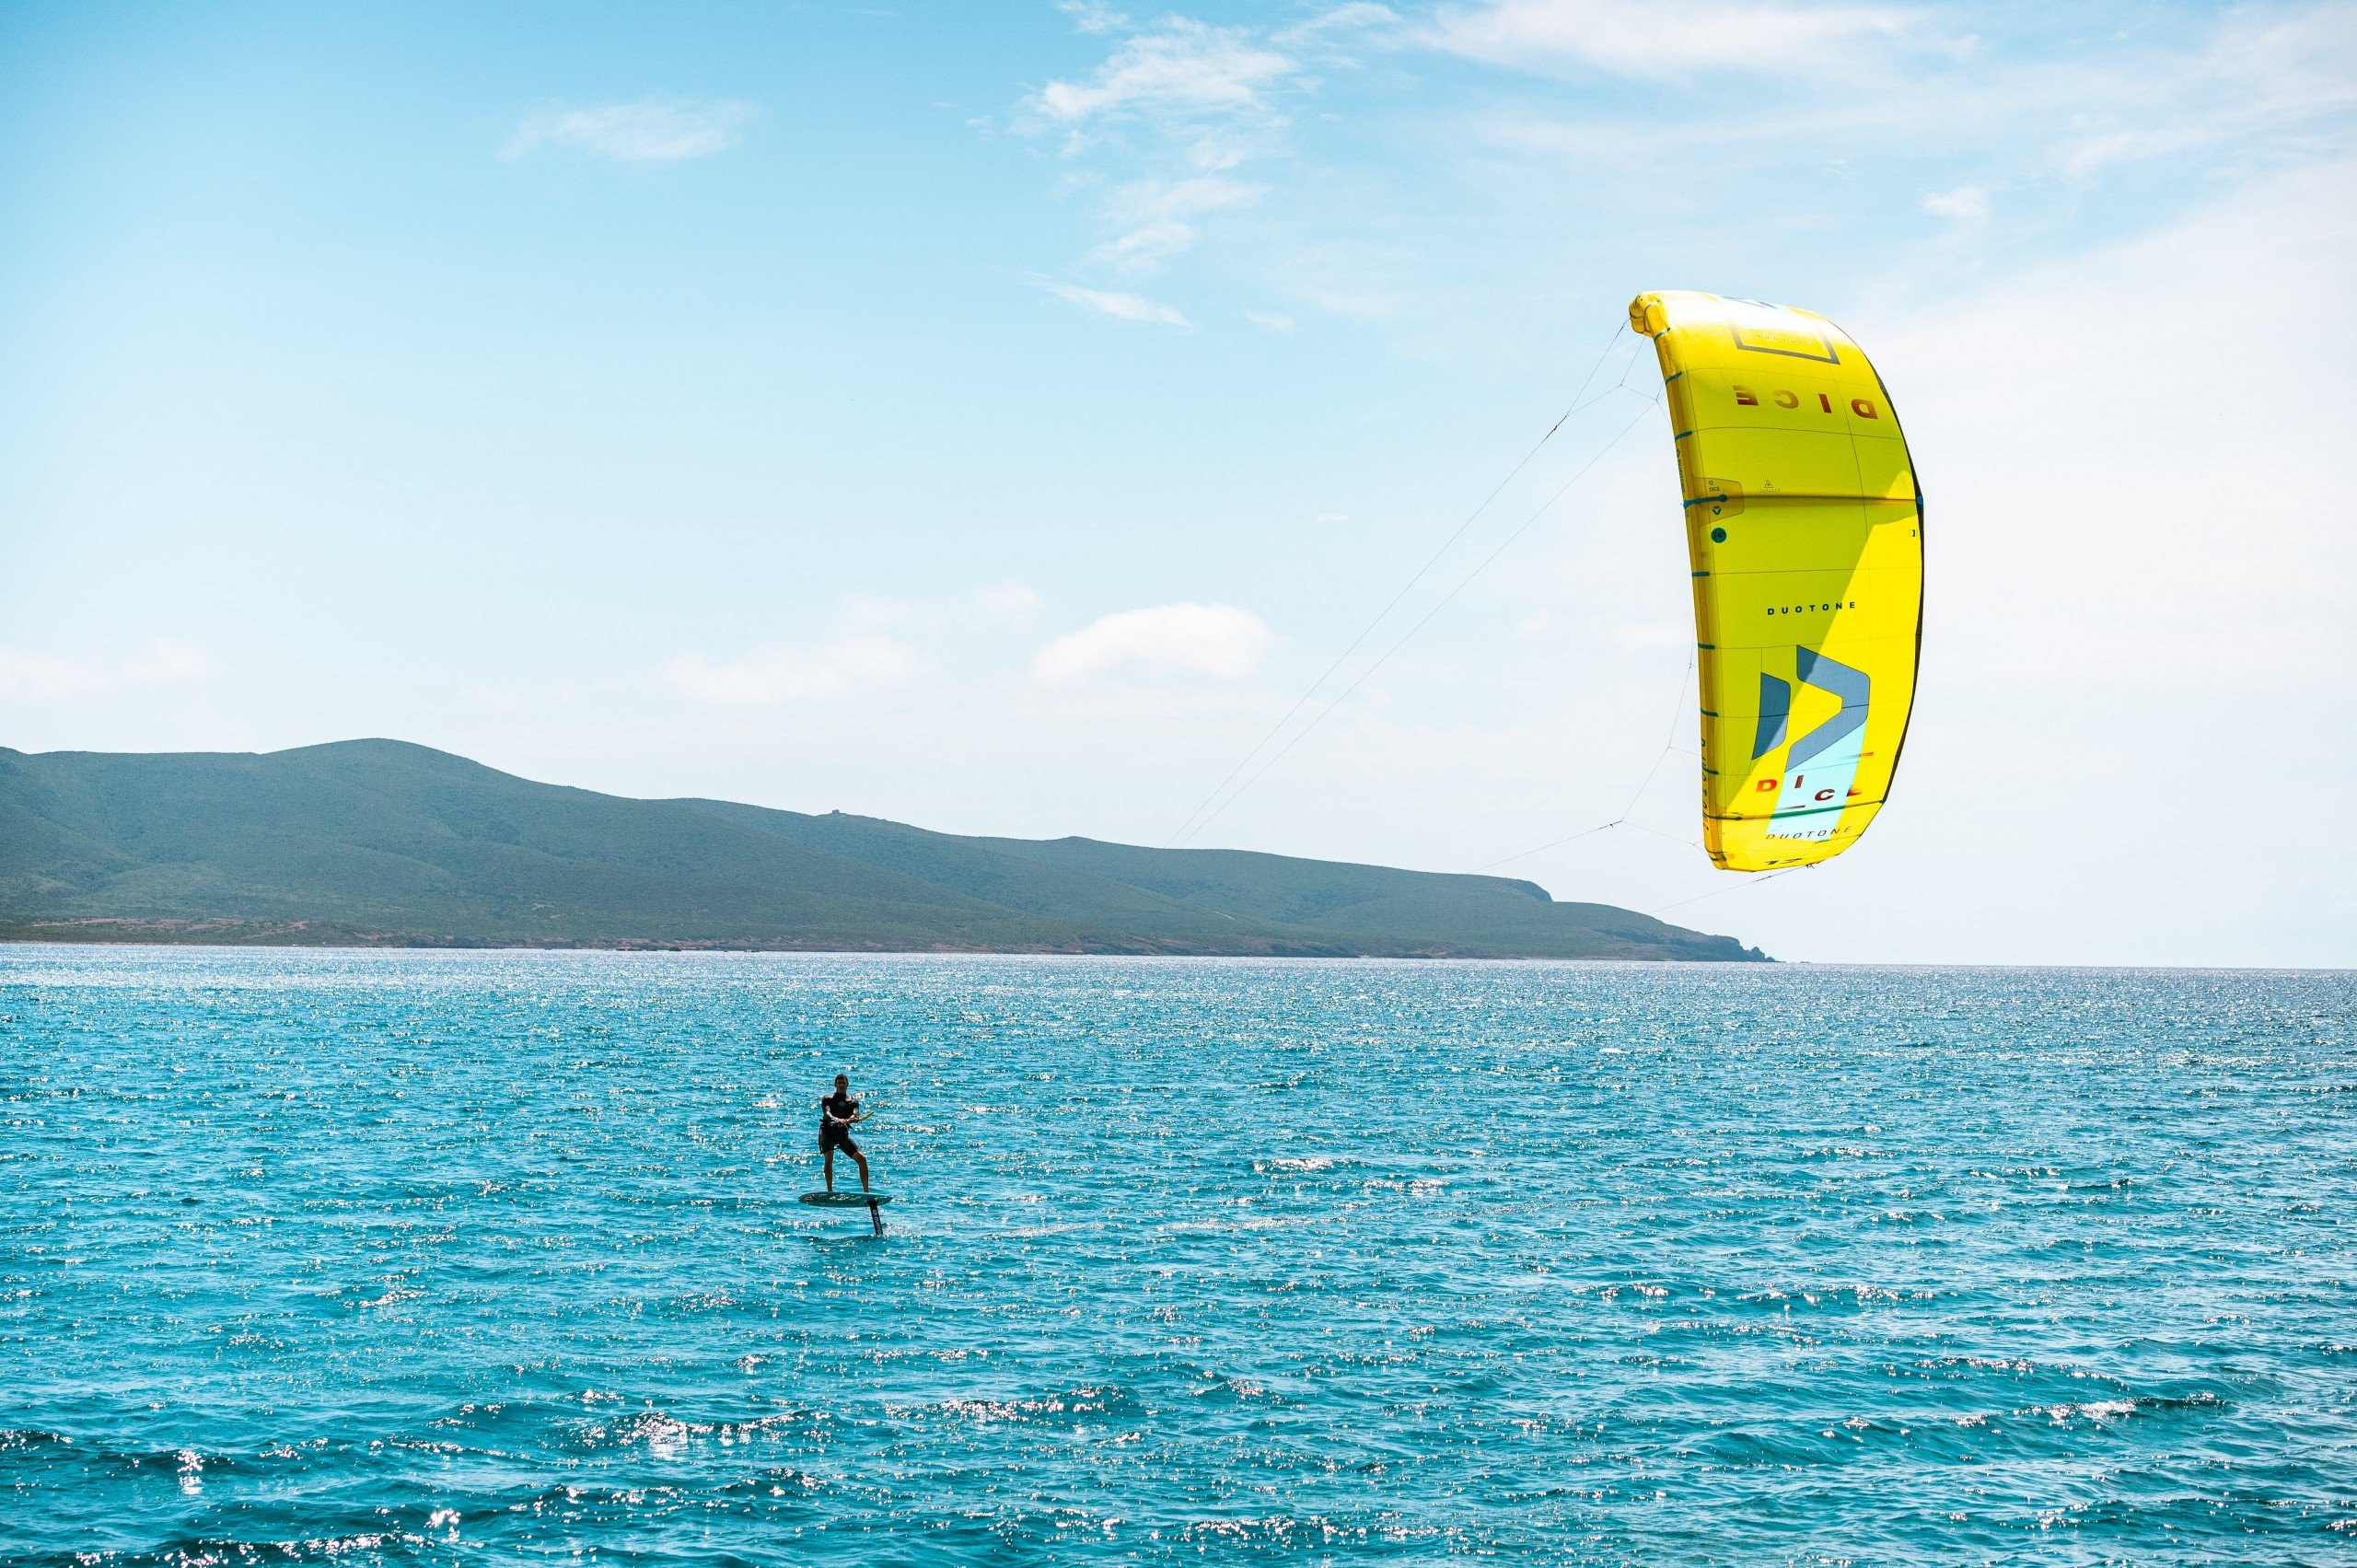 Simone-Timpano-istruttore-kitesurf-bodydrag-zanzibar